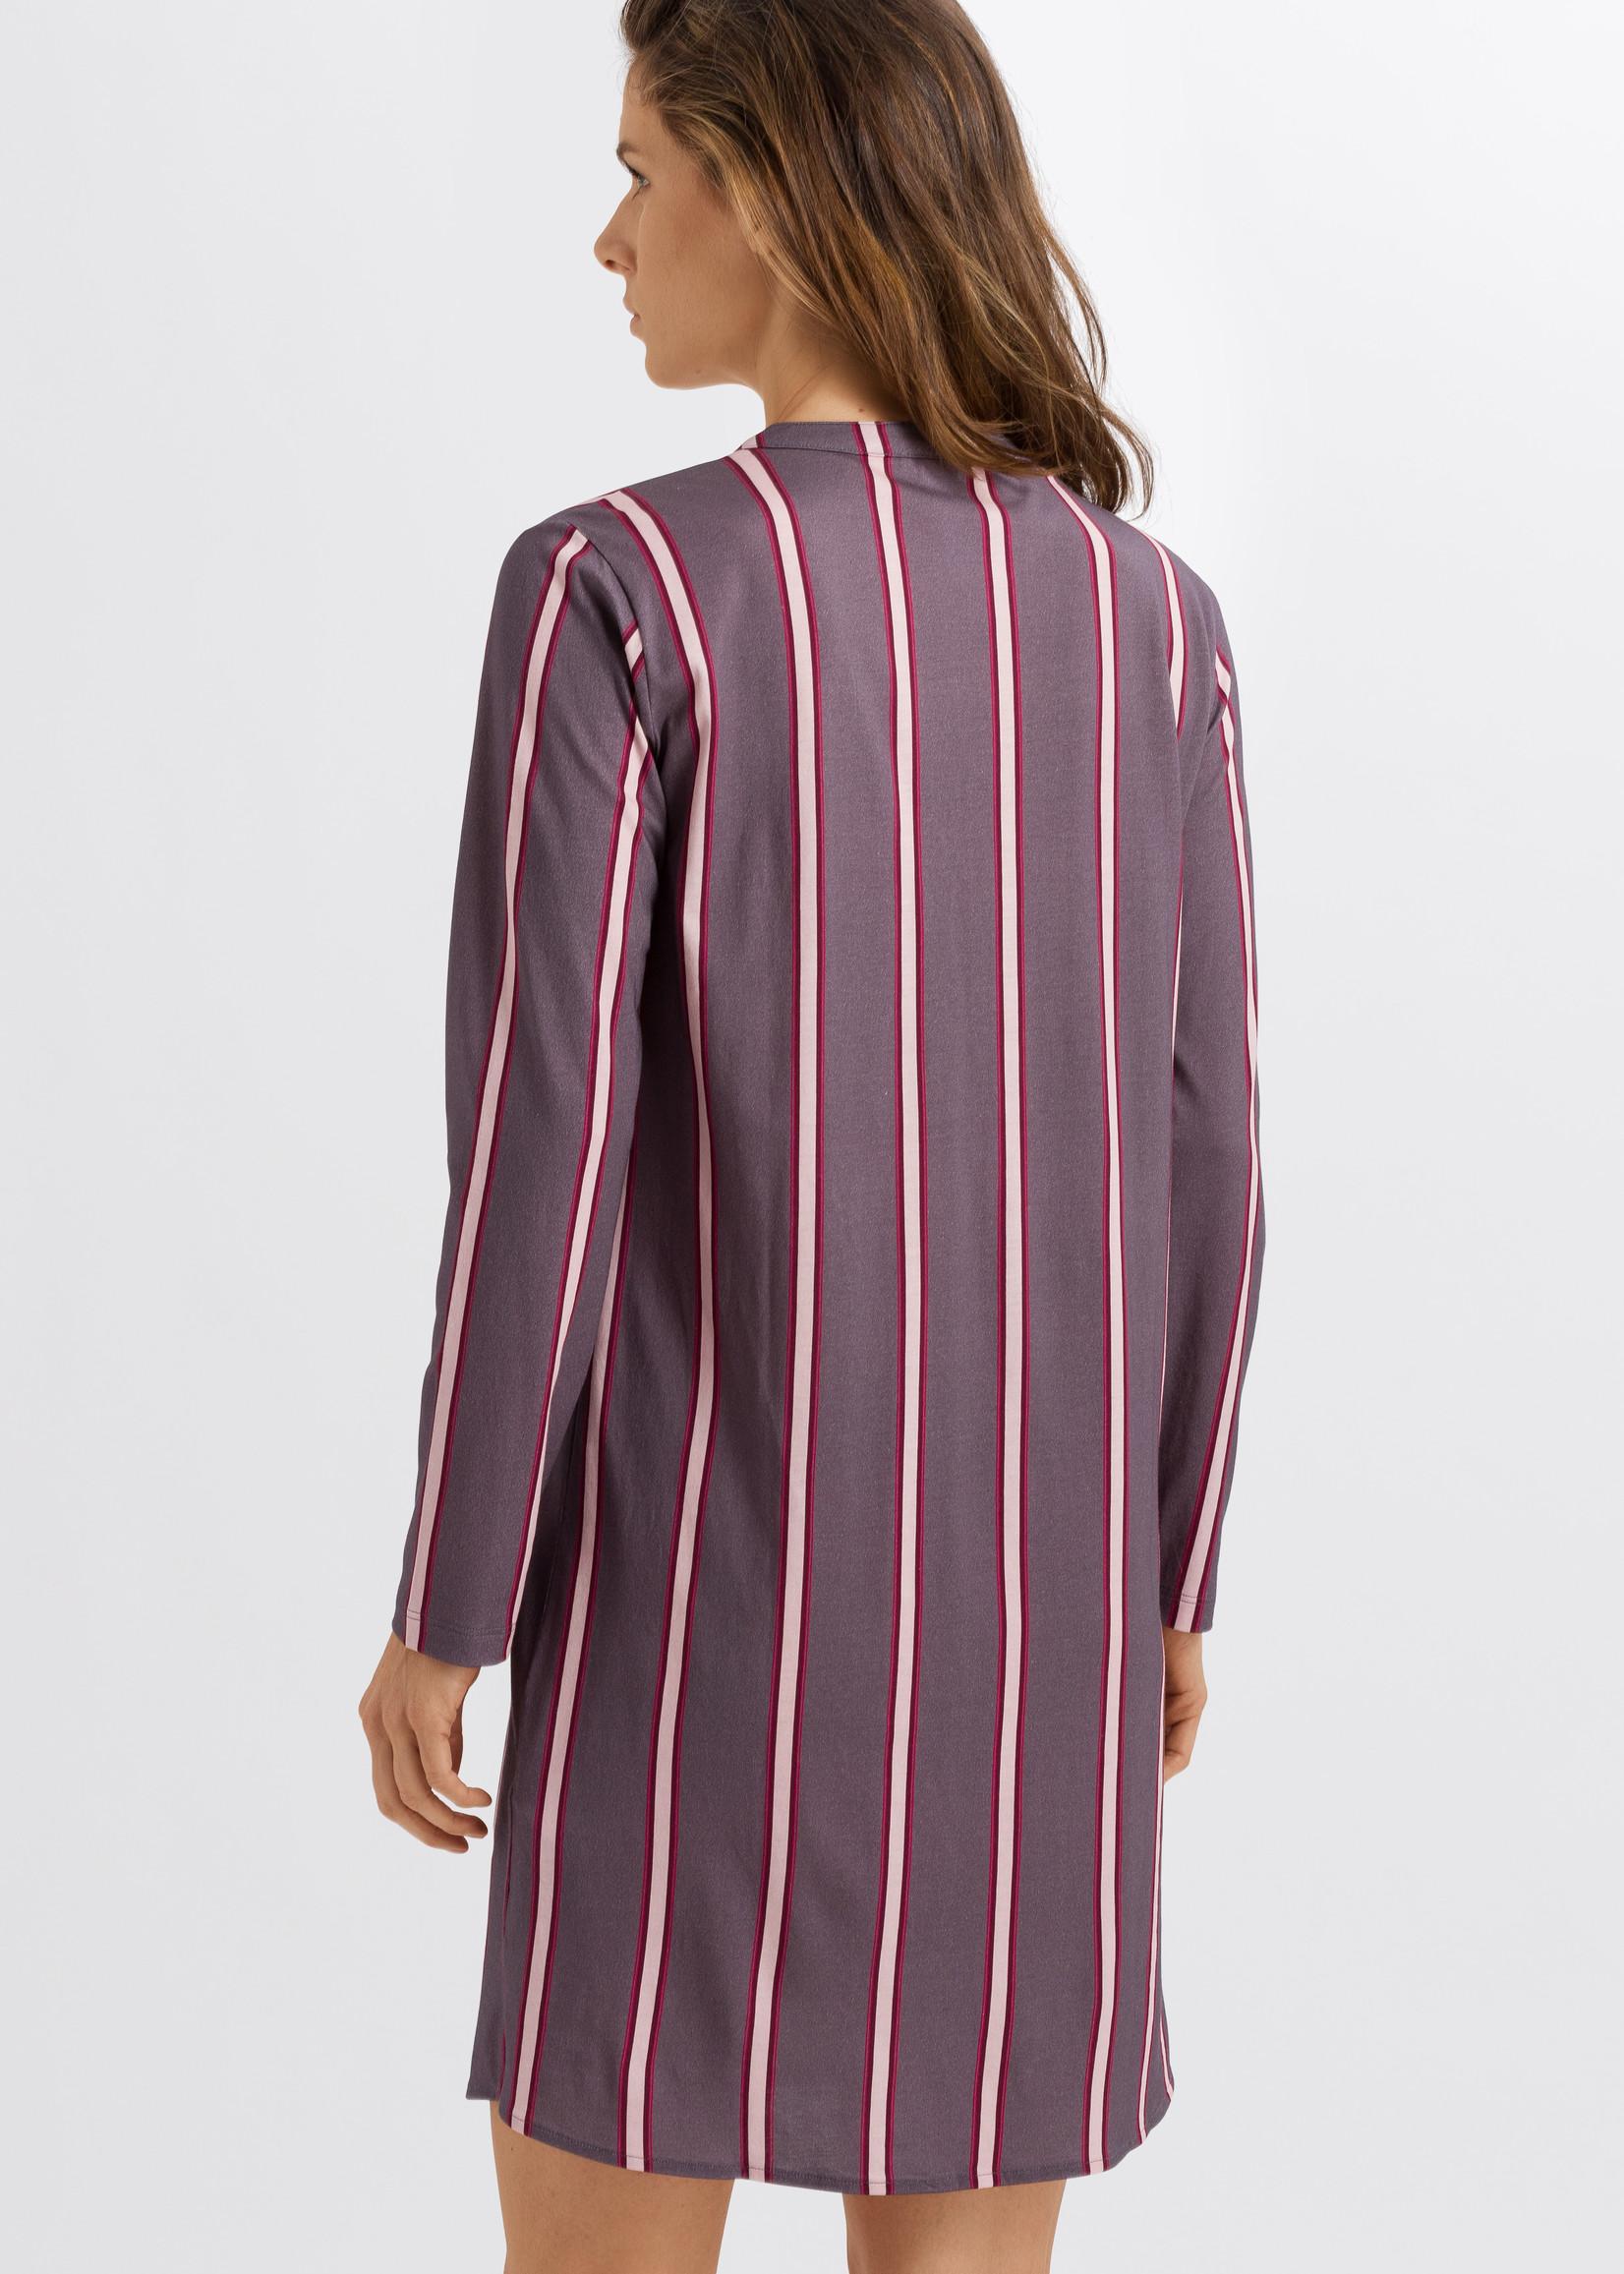 Hanro Sleep & Lounge Stripe Nightshirt